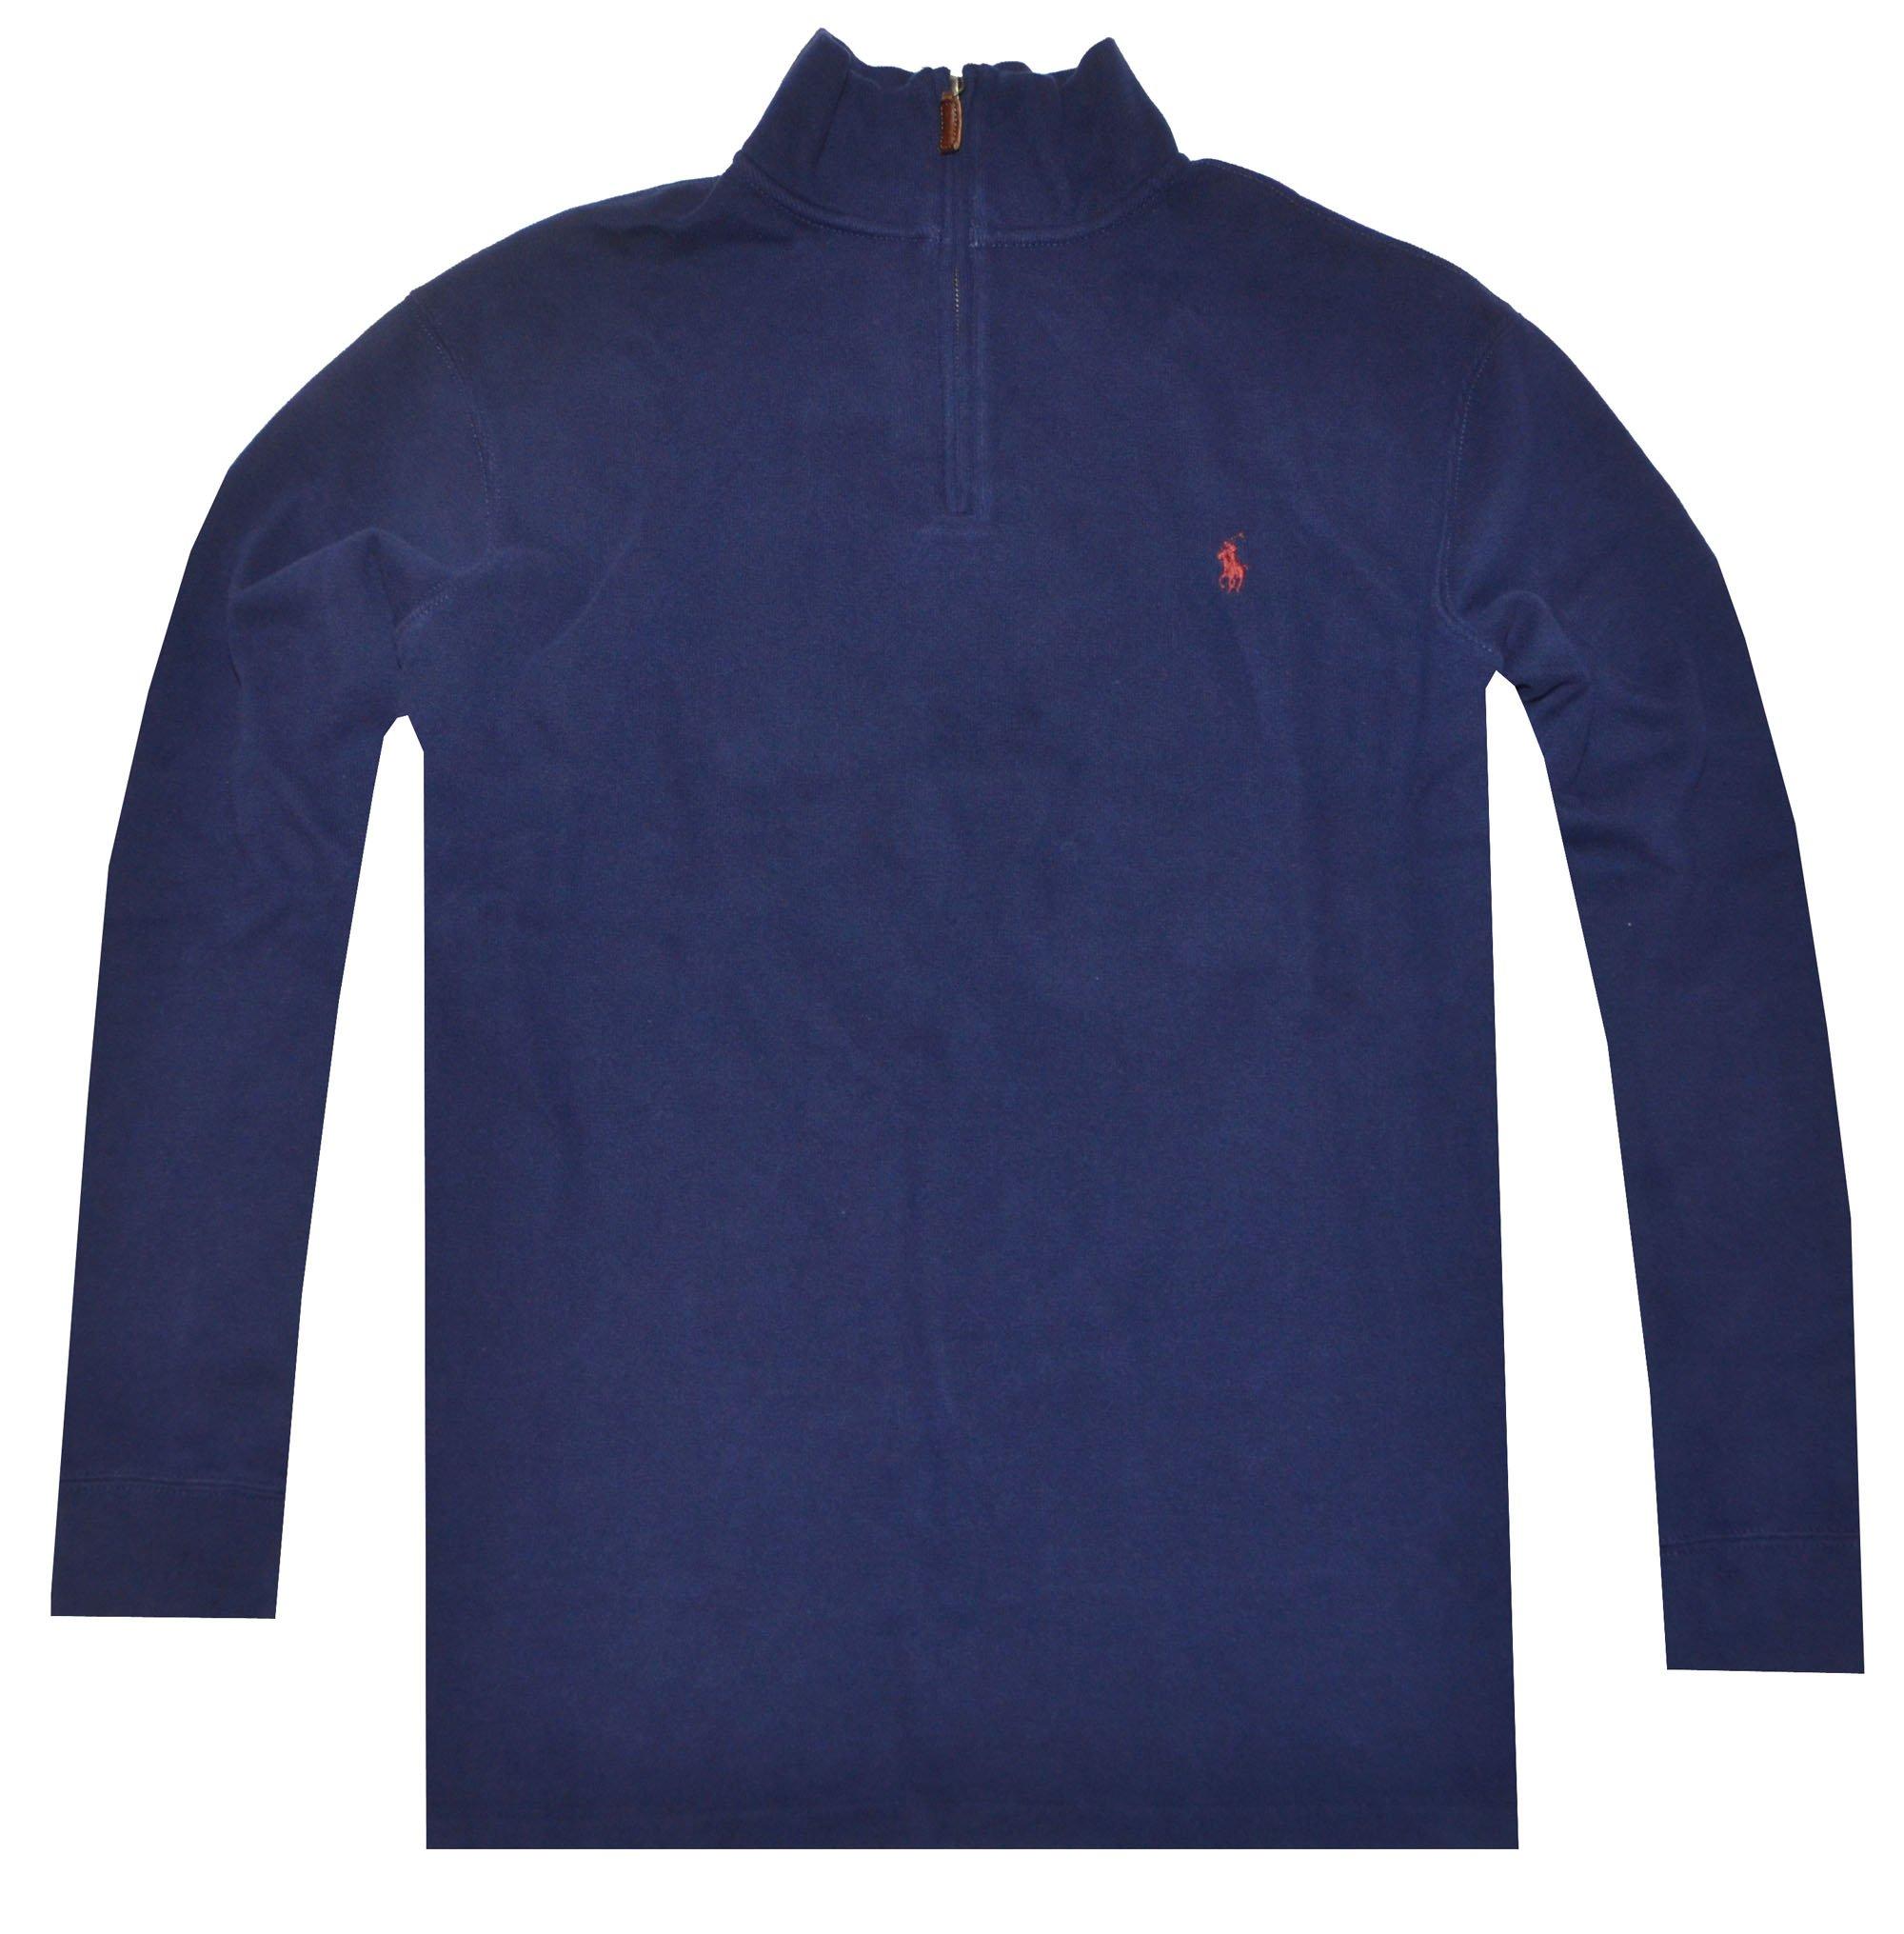 Polo Ralph Lauren Mens Half Zip French Rib Cotton Sweater (X-Large, Navy)